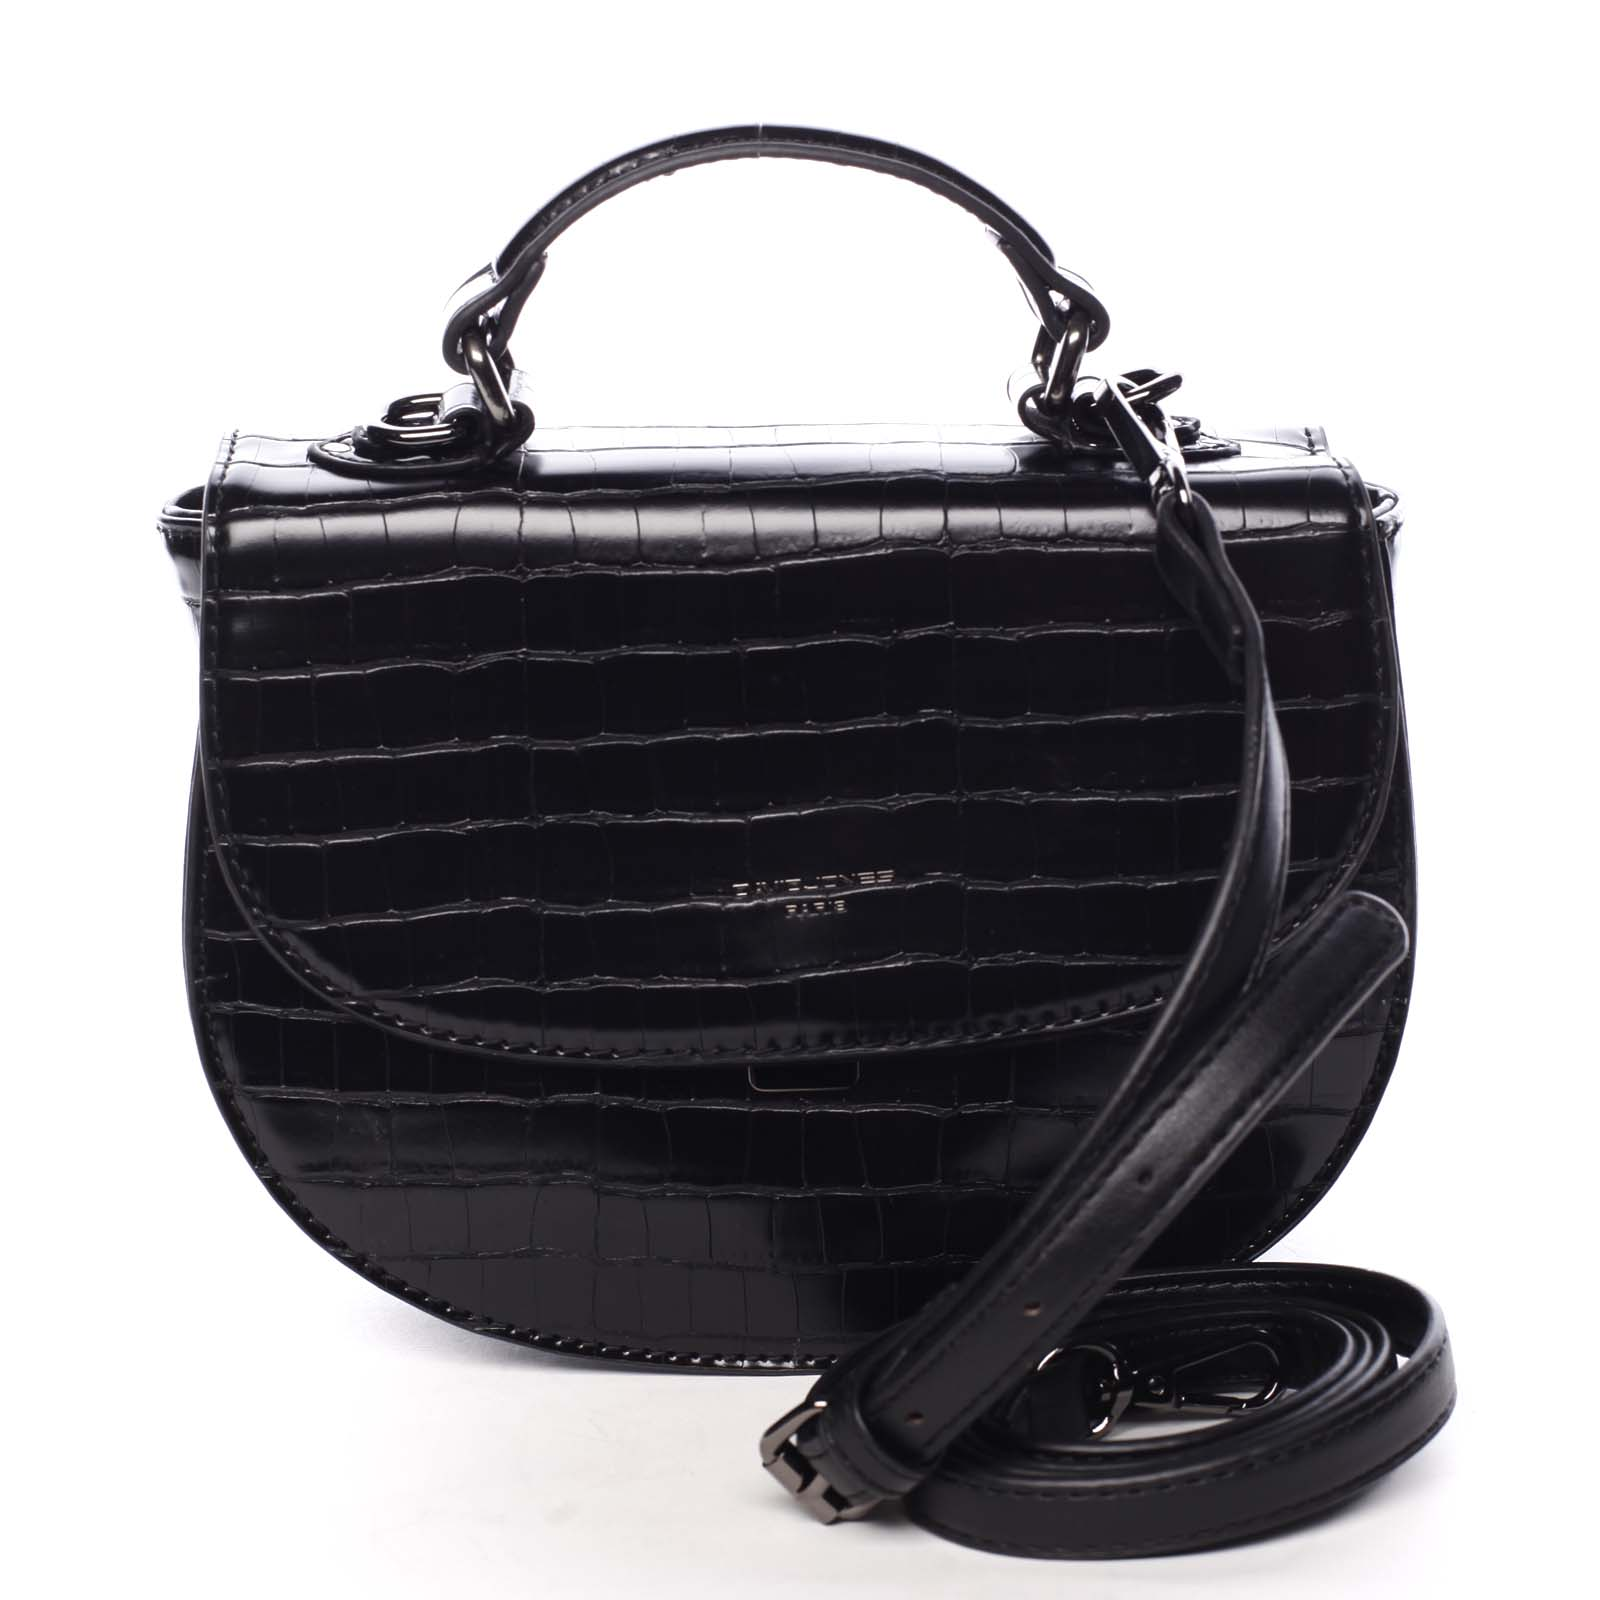 Dámska kabelka do ruky čierna - David Jones Cosette čierna